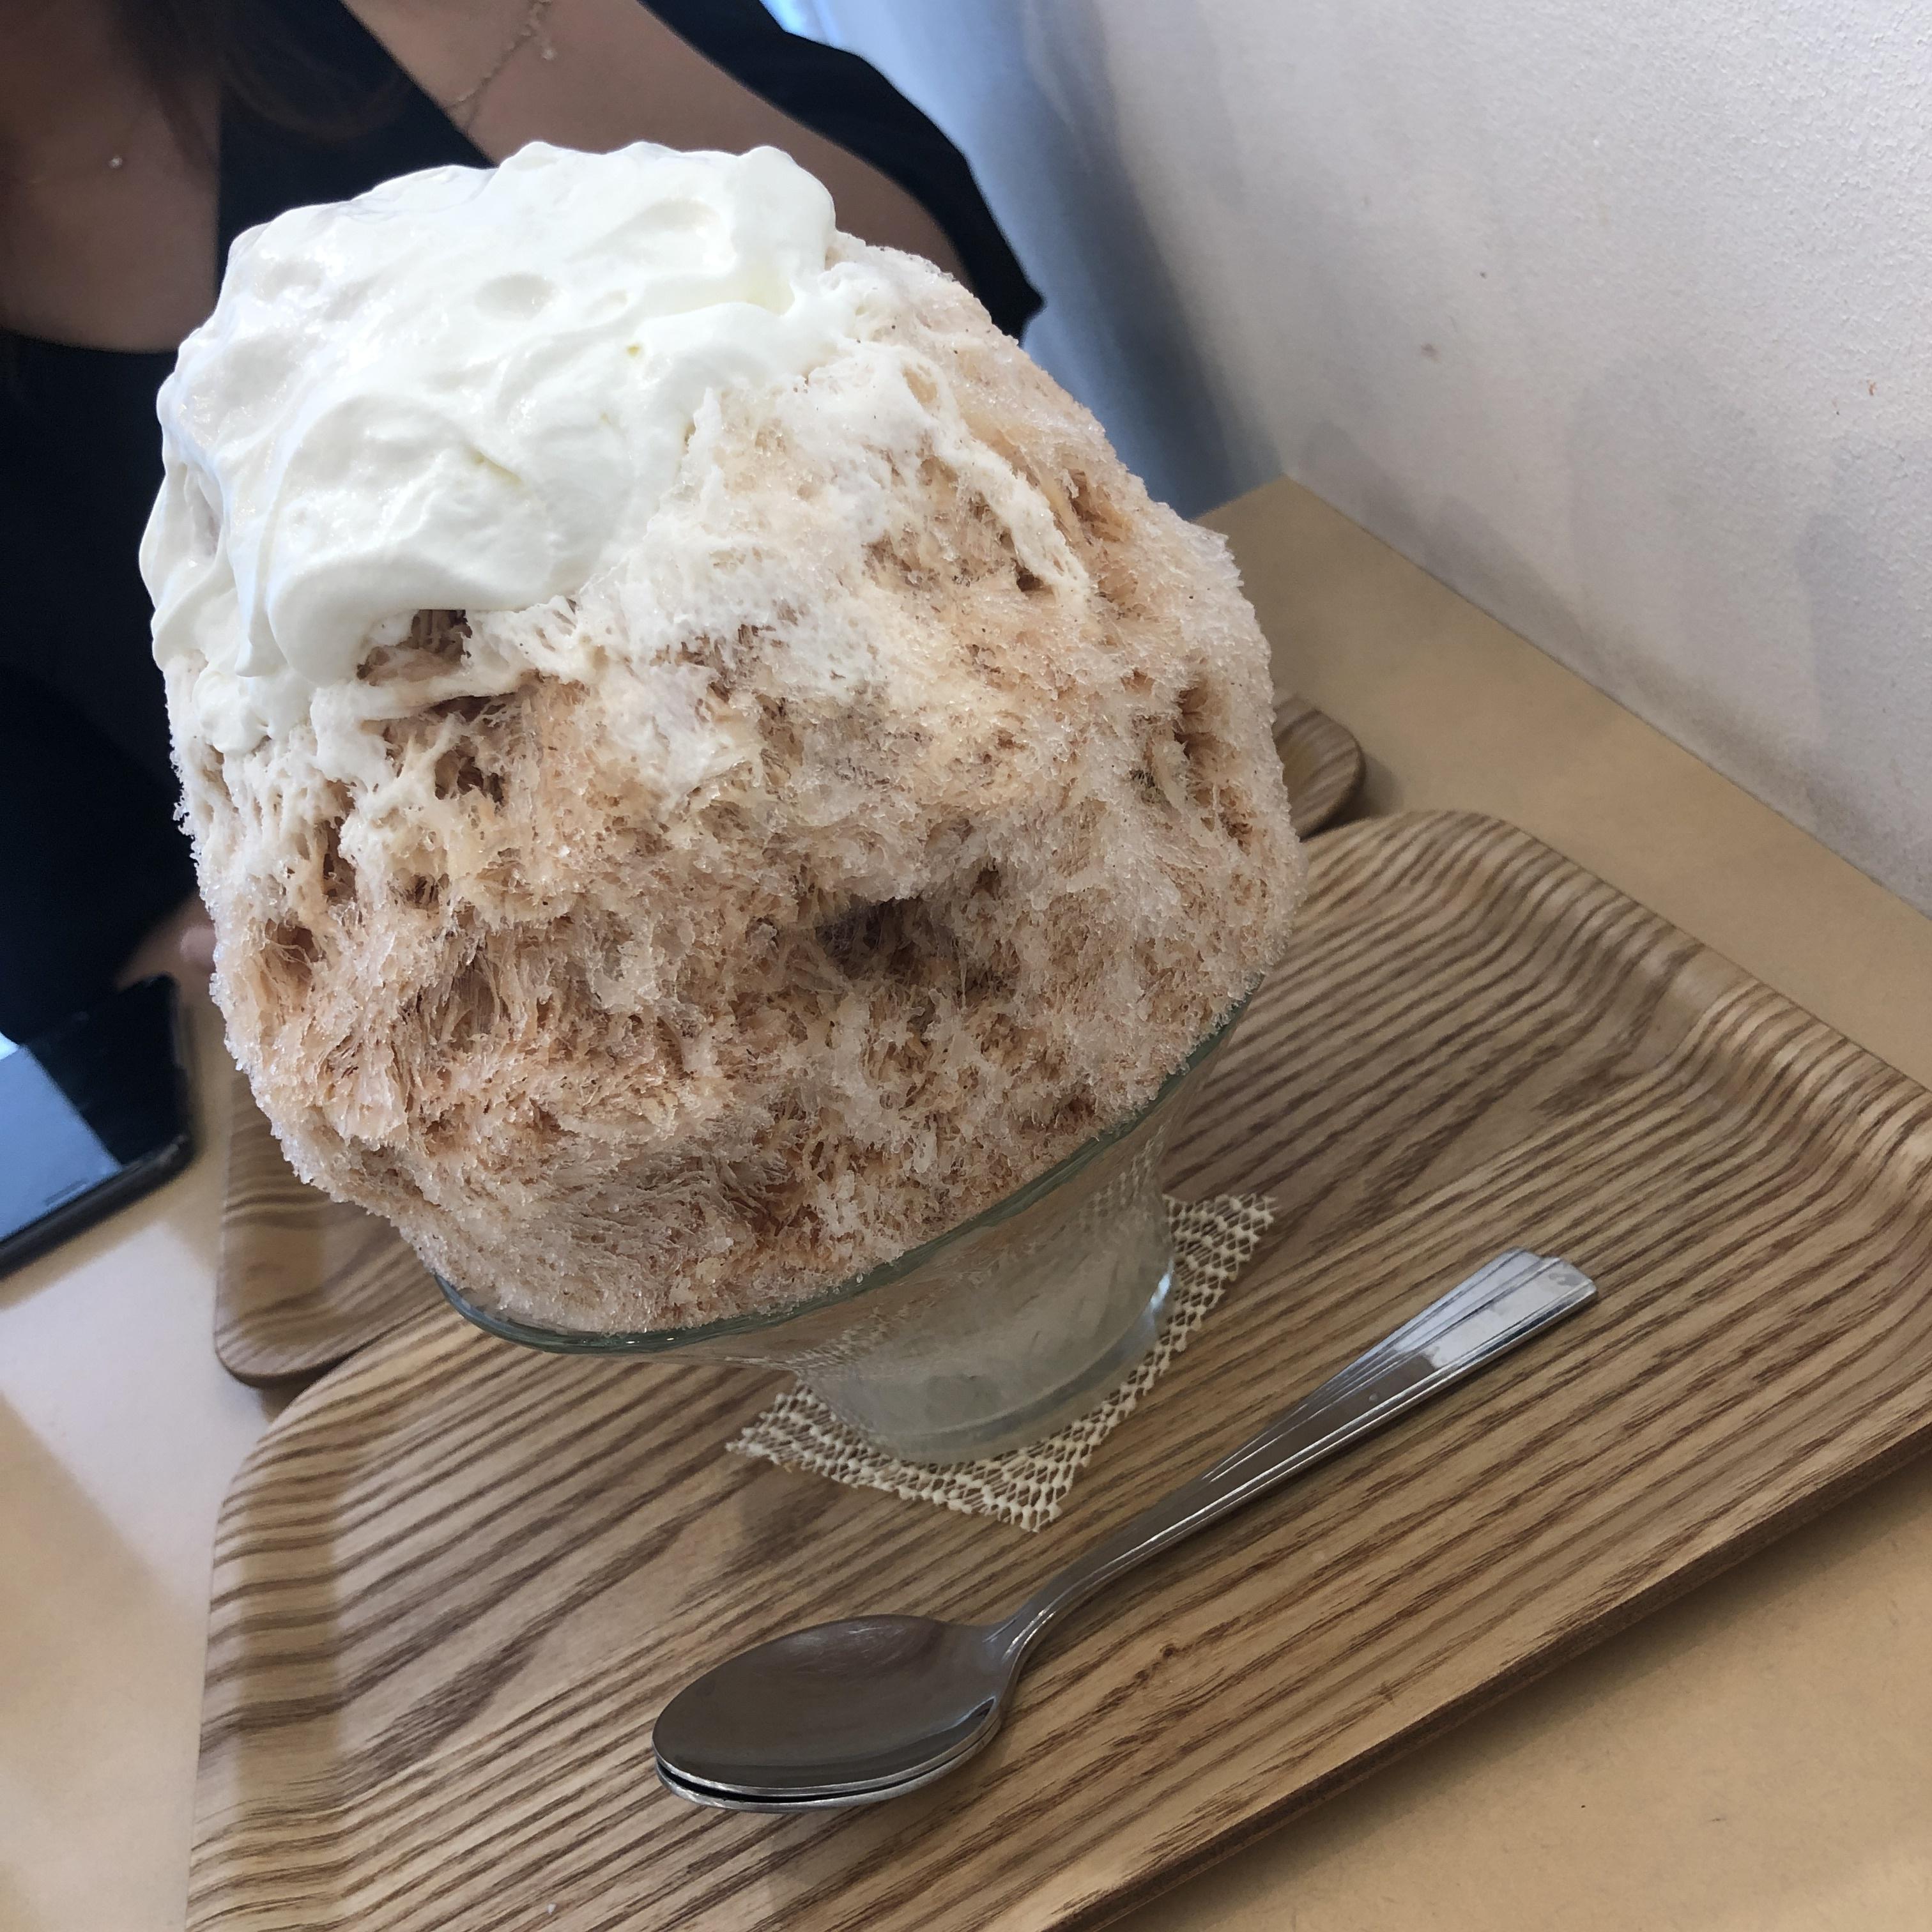 Vol.75♡ 紅茶好き必見!紅茶専門店のかき氷【CONTENART(コンテナート)】_1_1